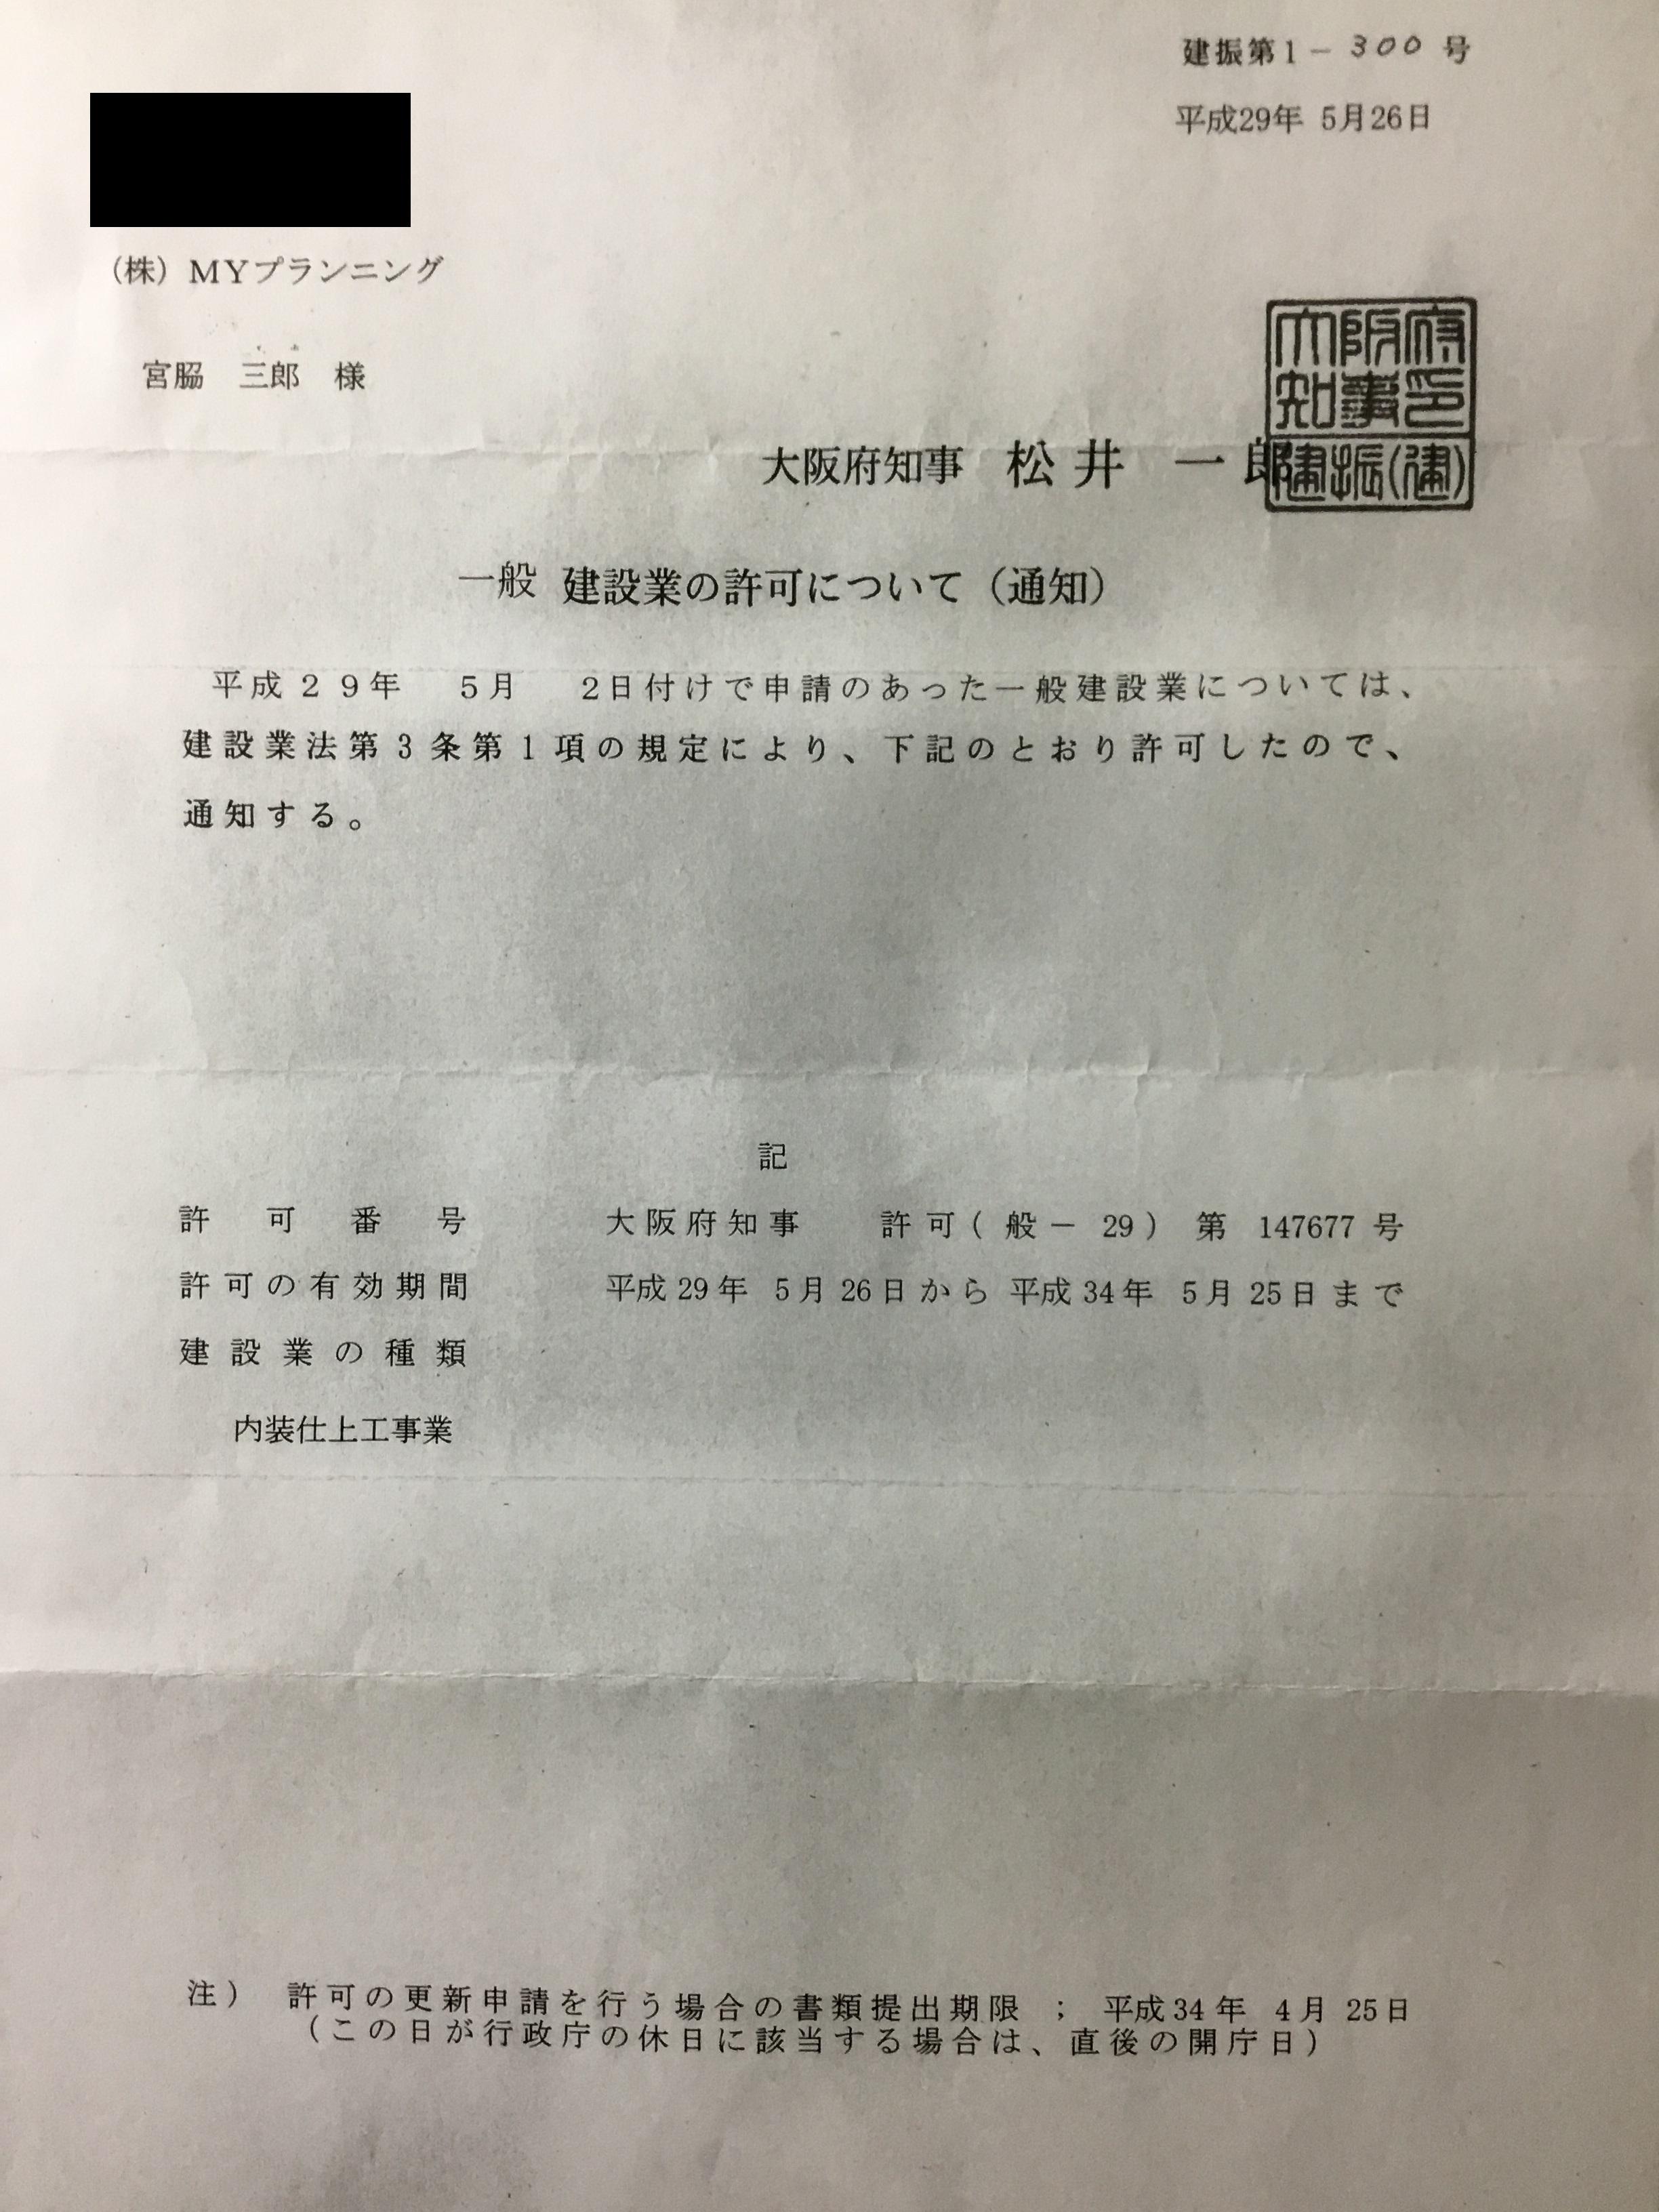 大阪府知事 内装仕上工事業許可 株式会社MYプランニング様